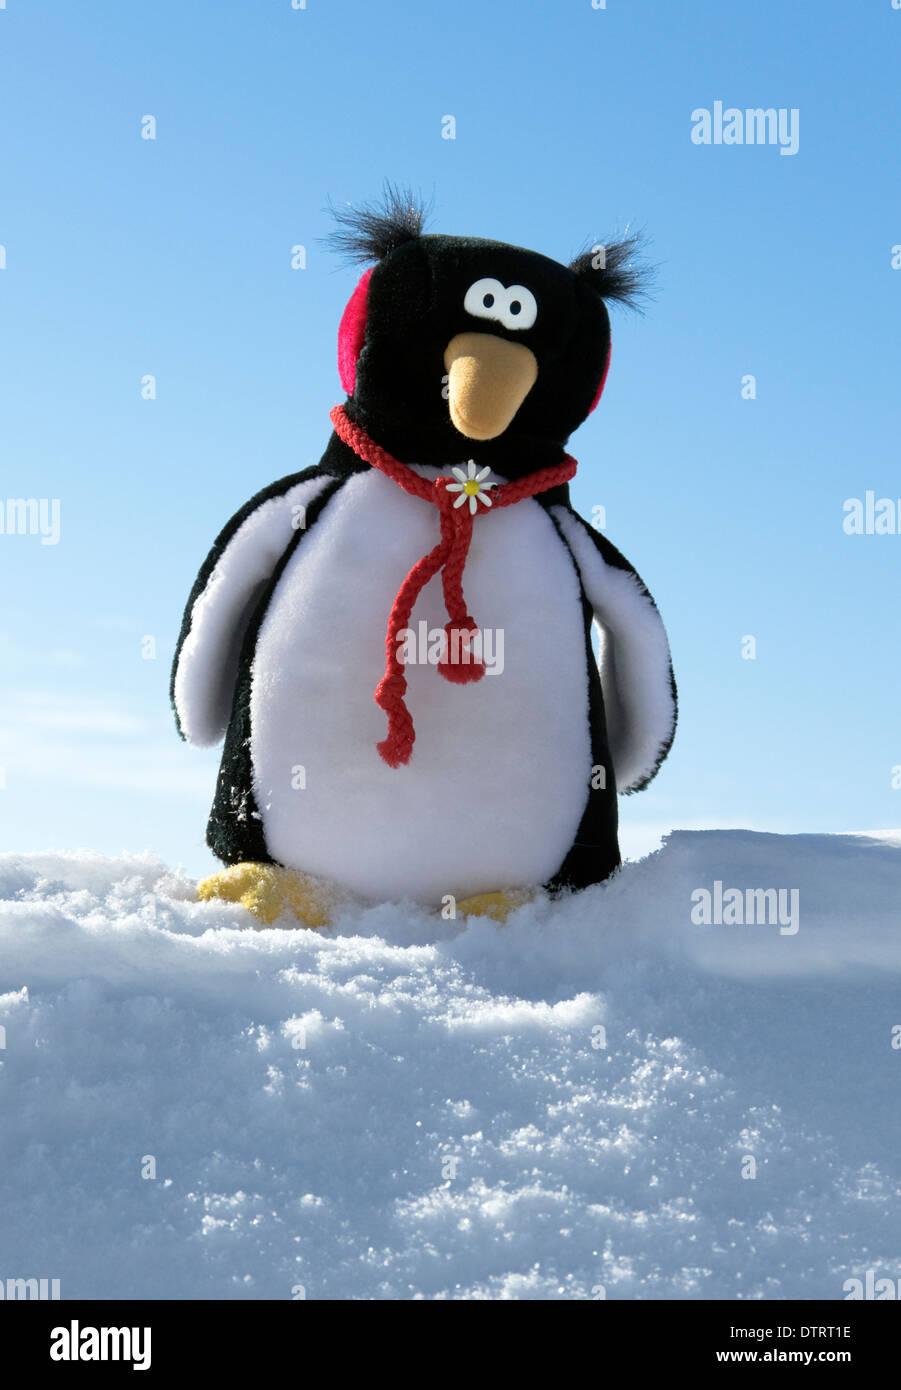 Peluche pingouin sur la neige Photo Stock